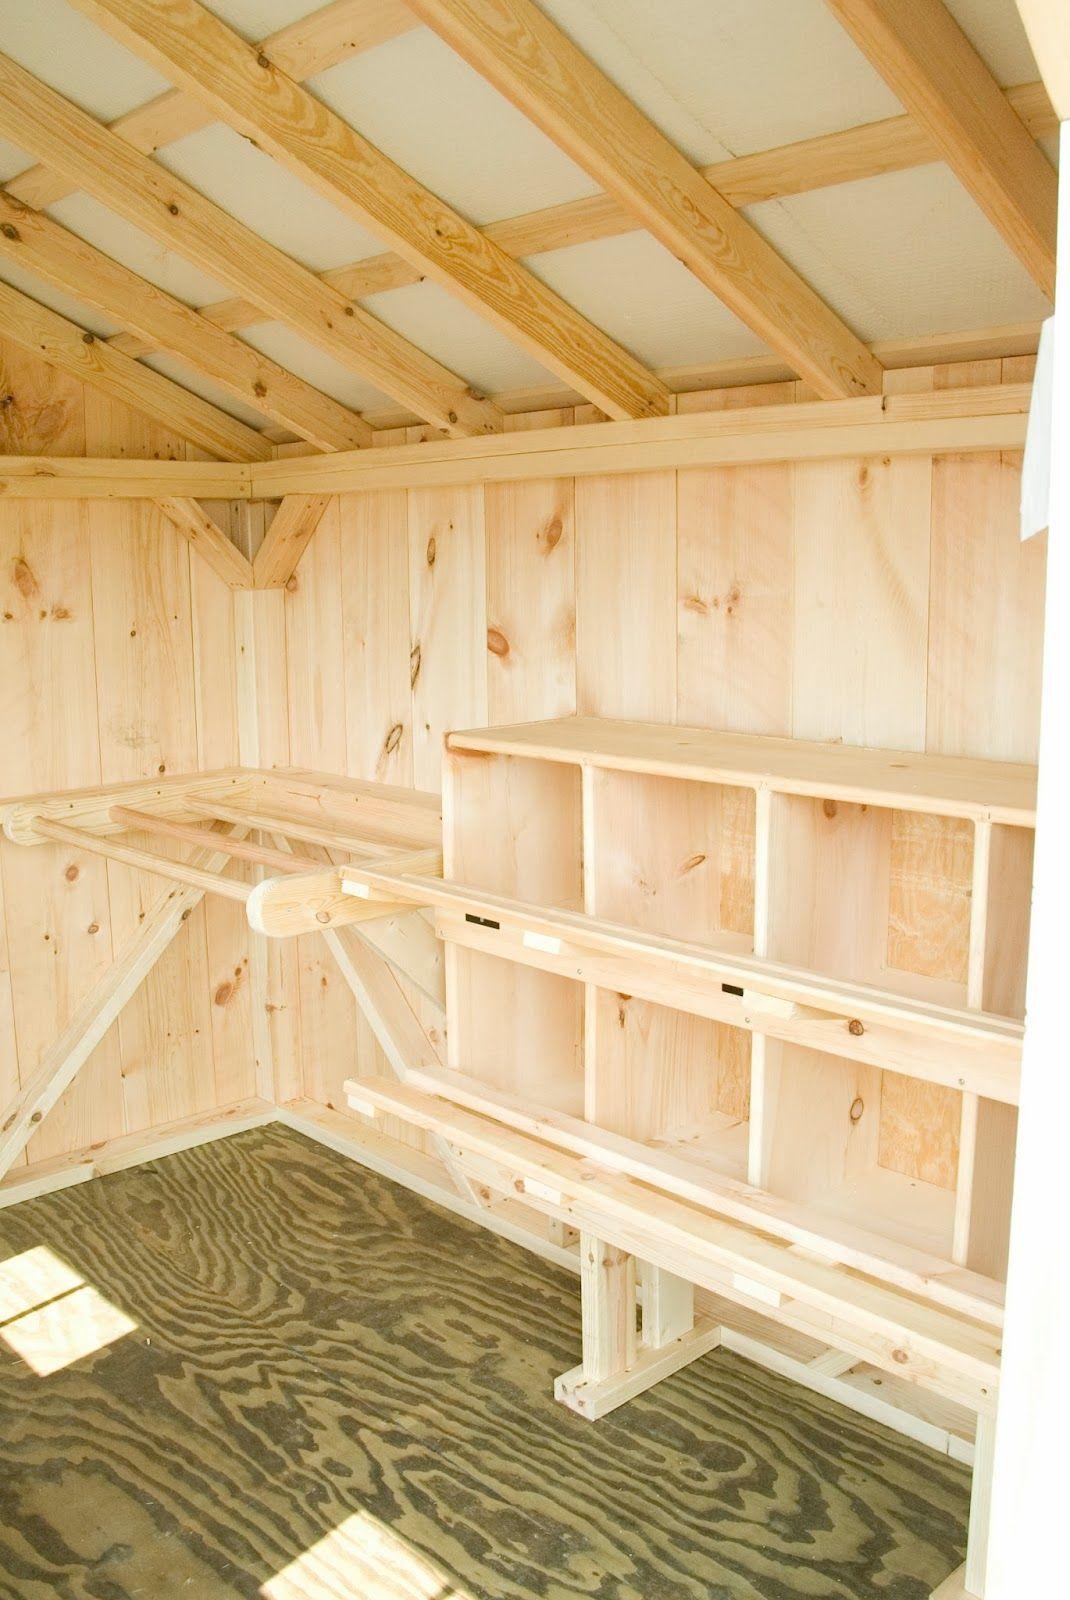 Chicken House Plans: Truths Of Building A Chicken Coop | Chicken ...